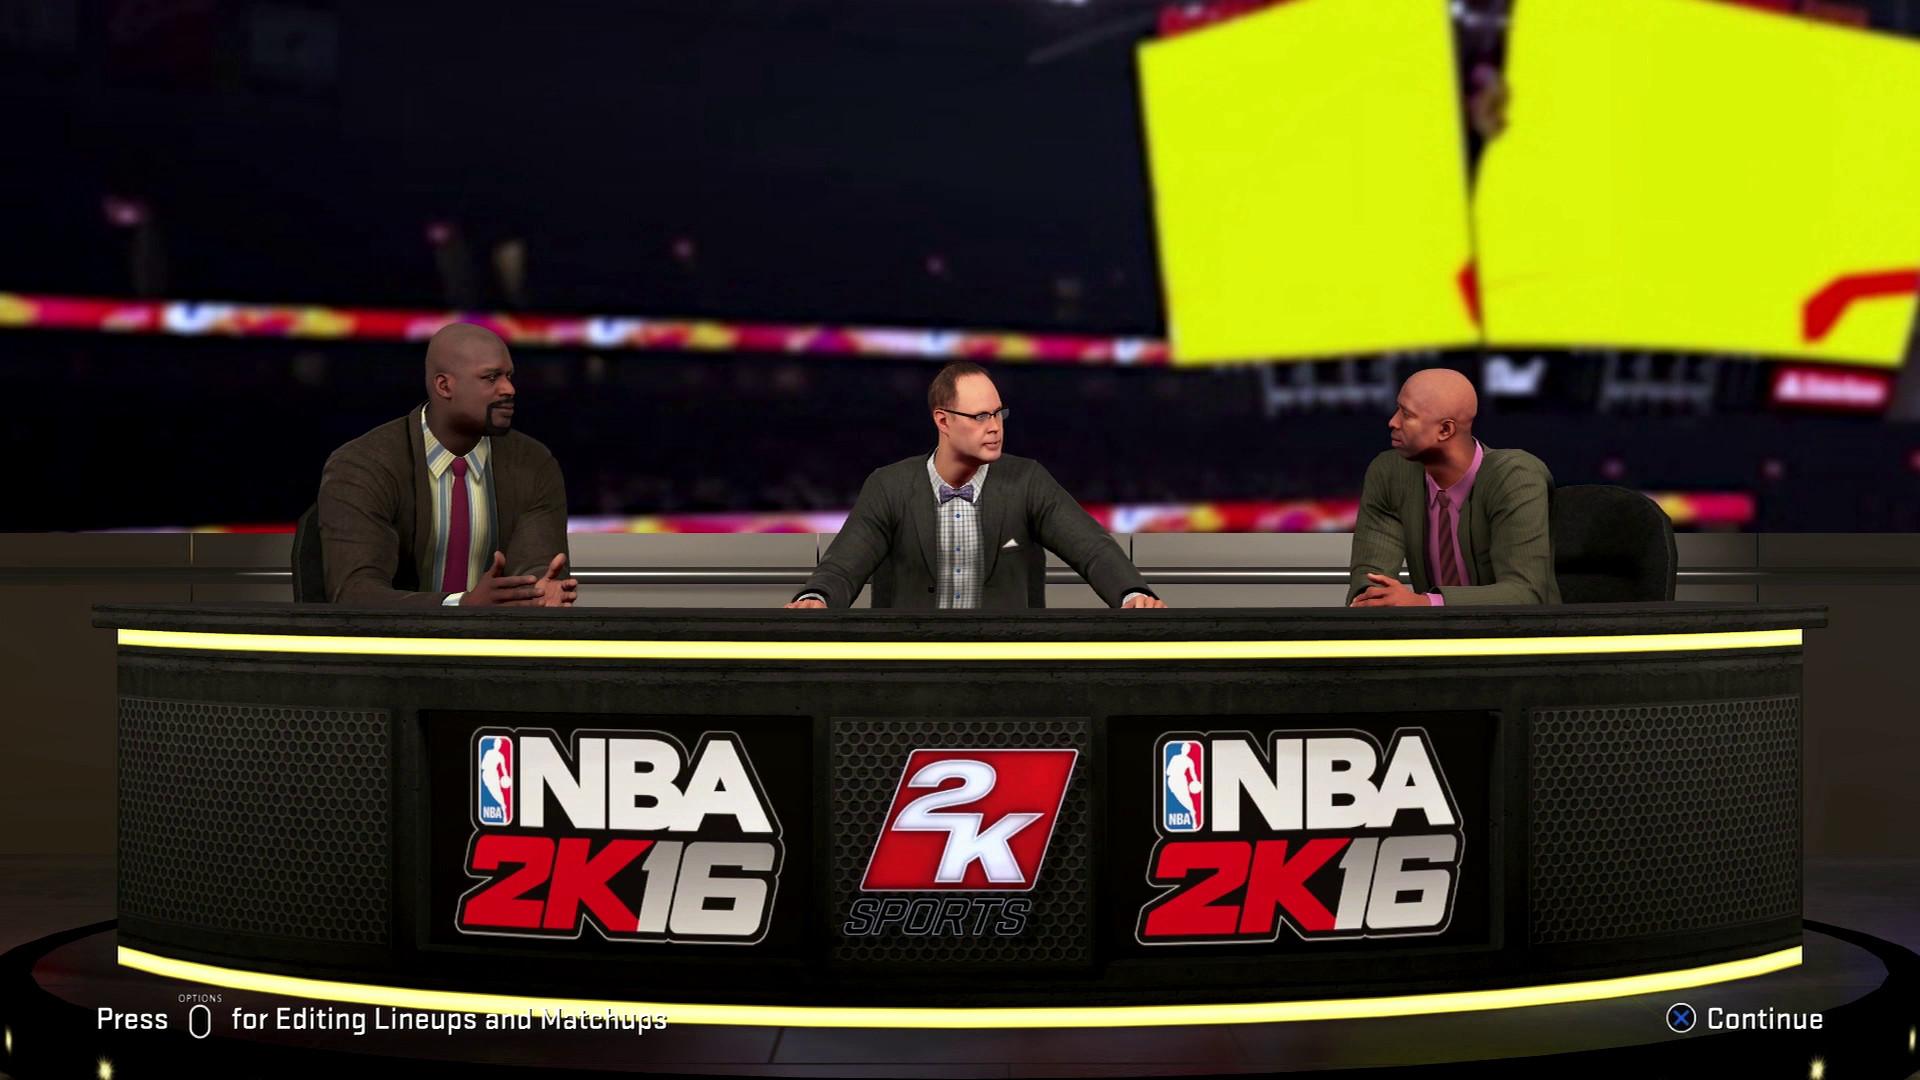 NBA 2K16's broadcast team gets bigger and a bit weirder